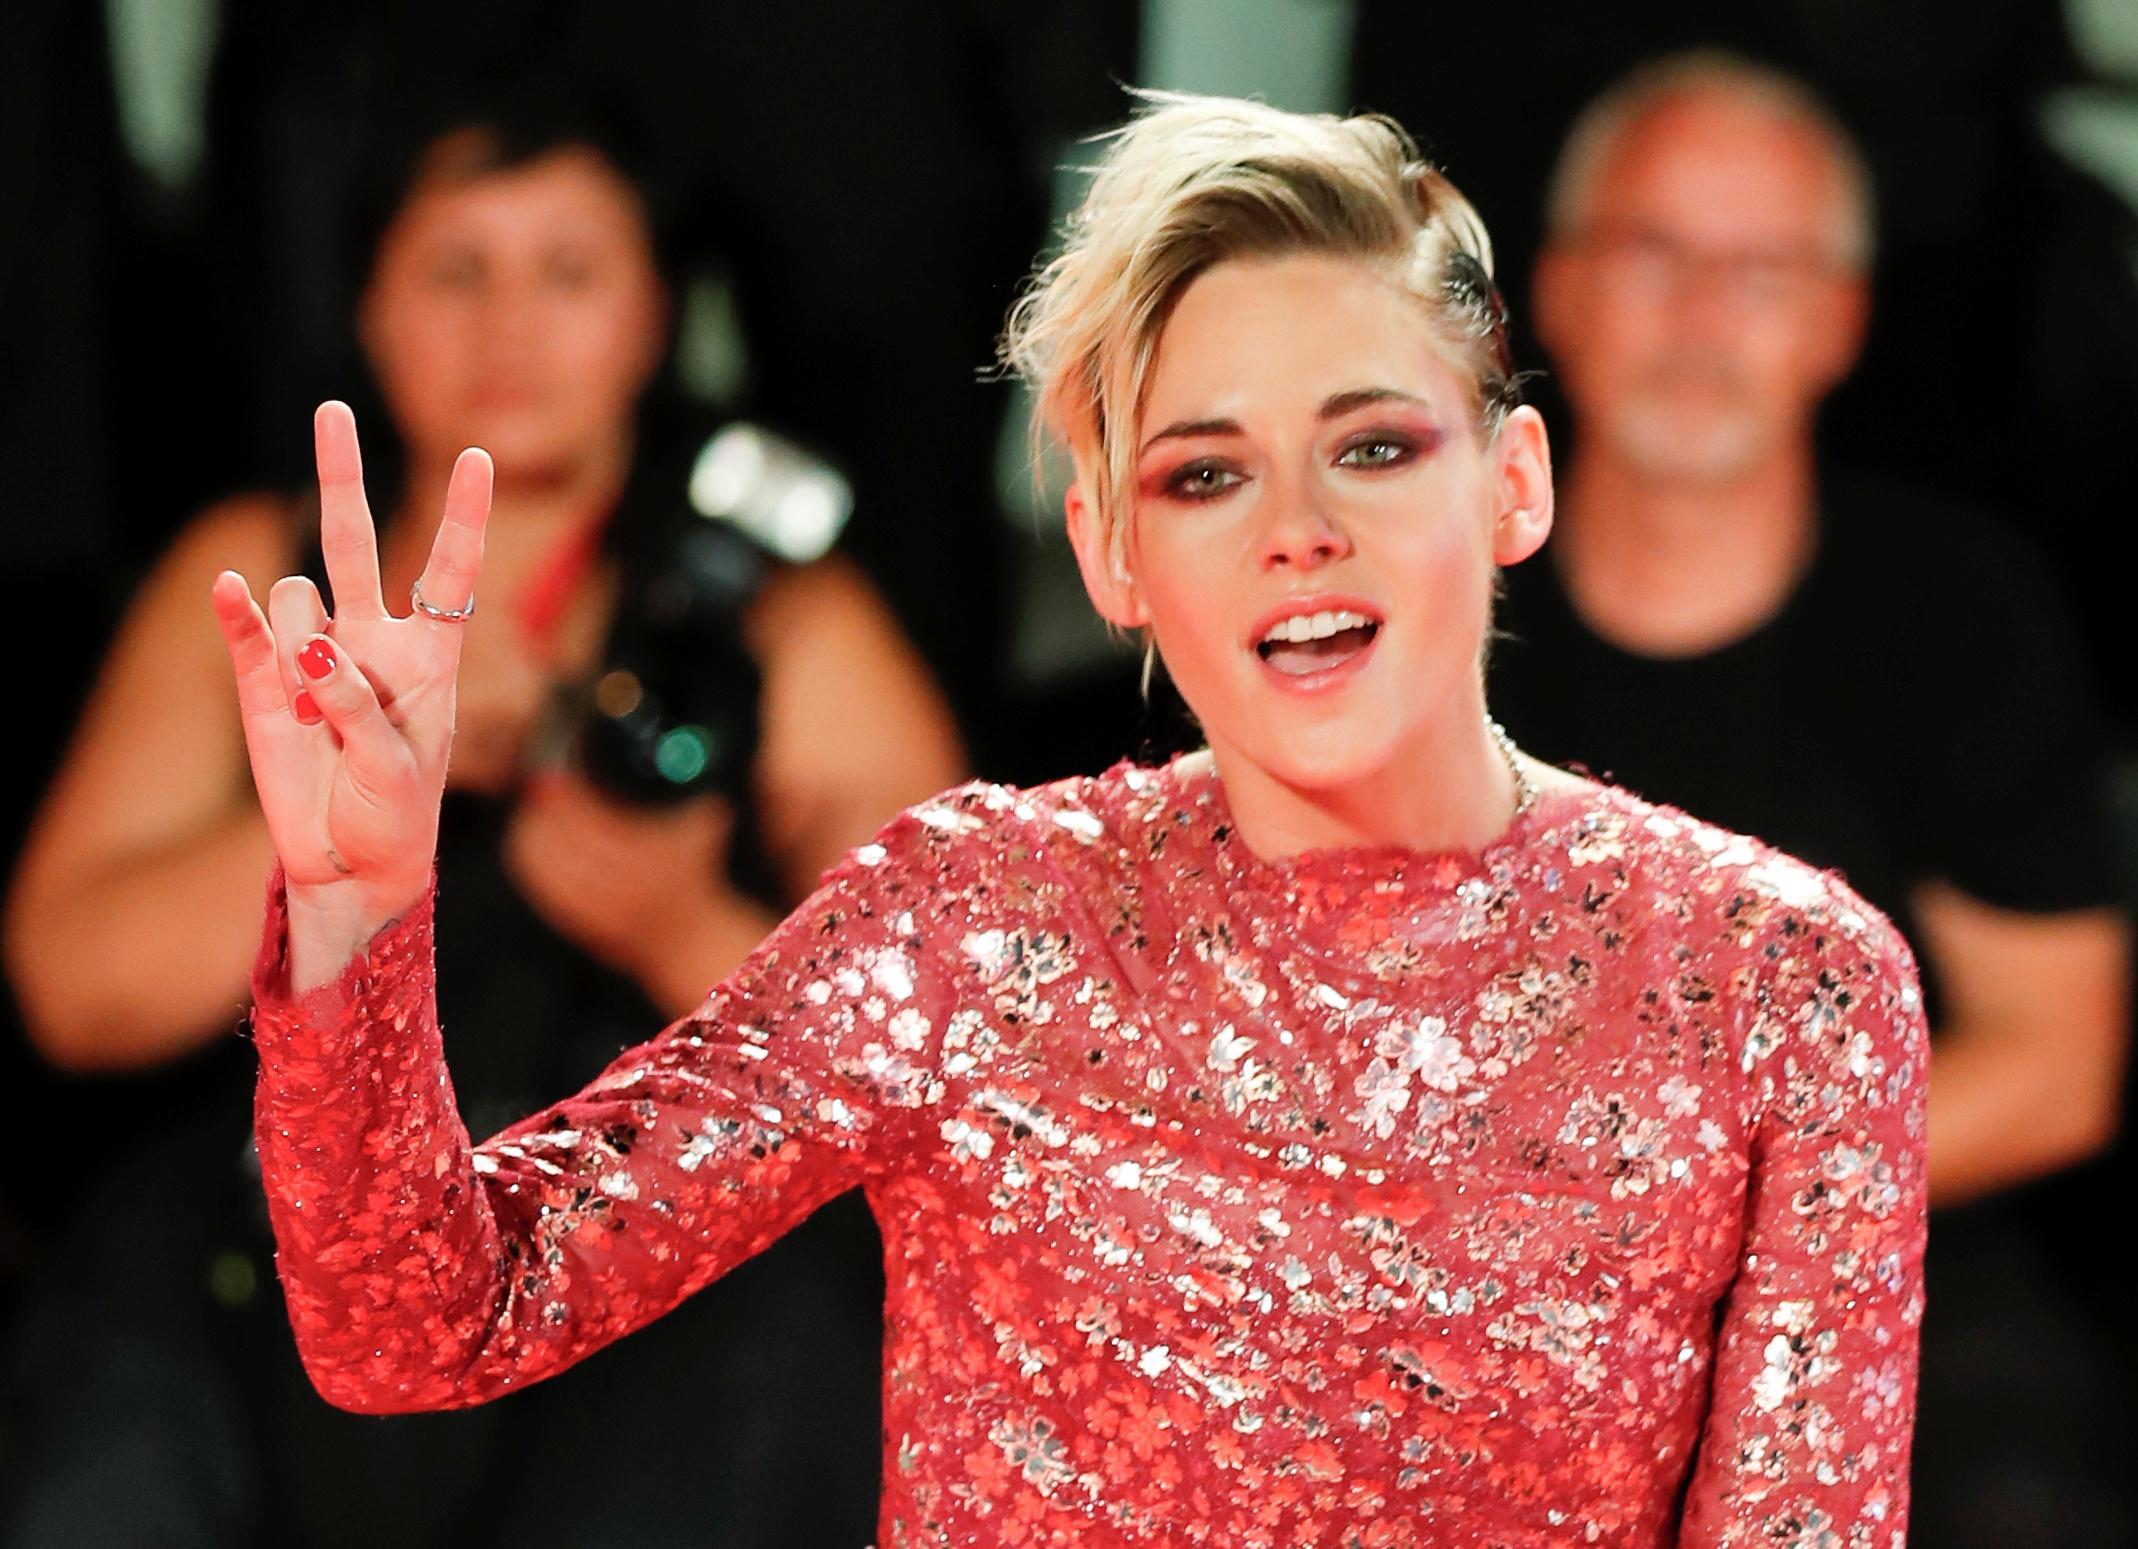 More than a haircut: Kristen Stewart aims to shine spotlight on Jean Seberg